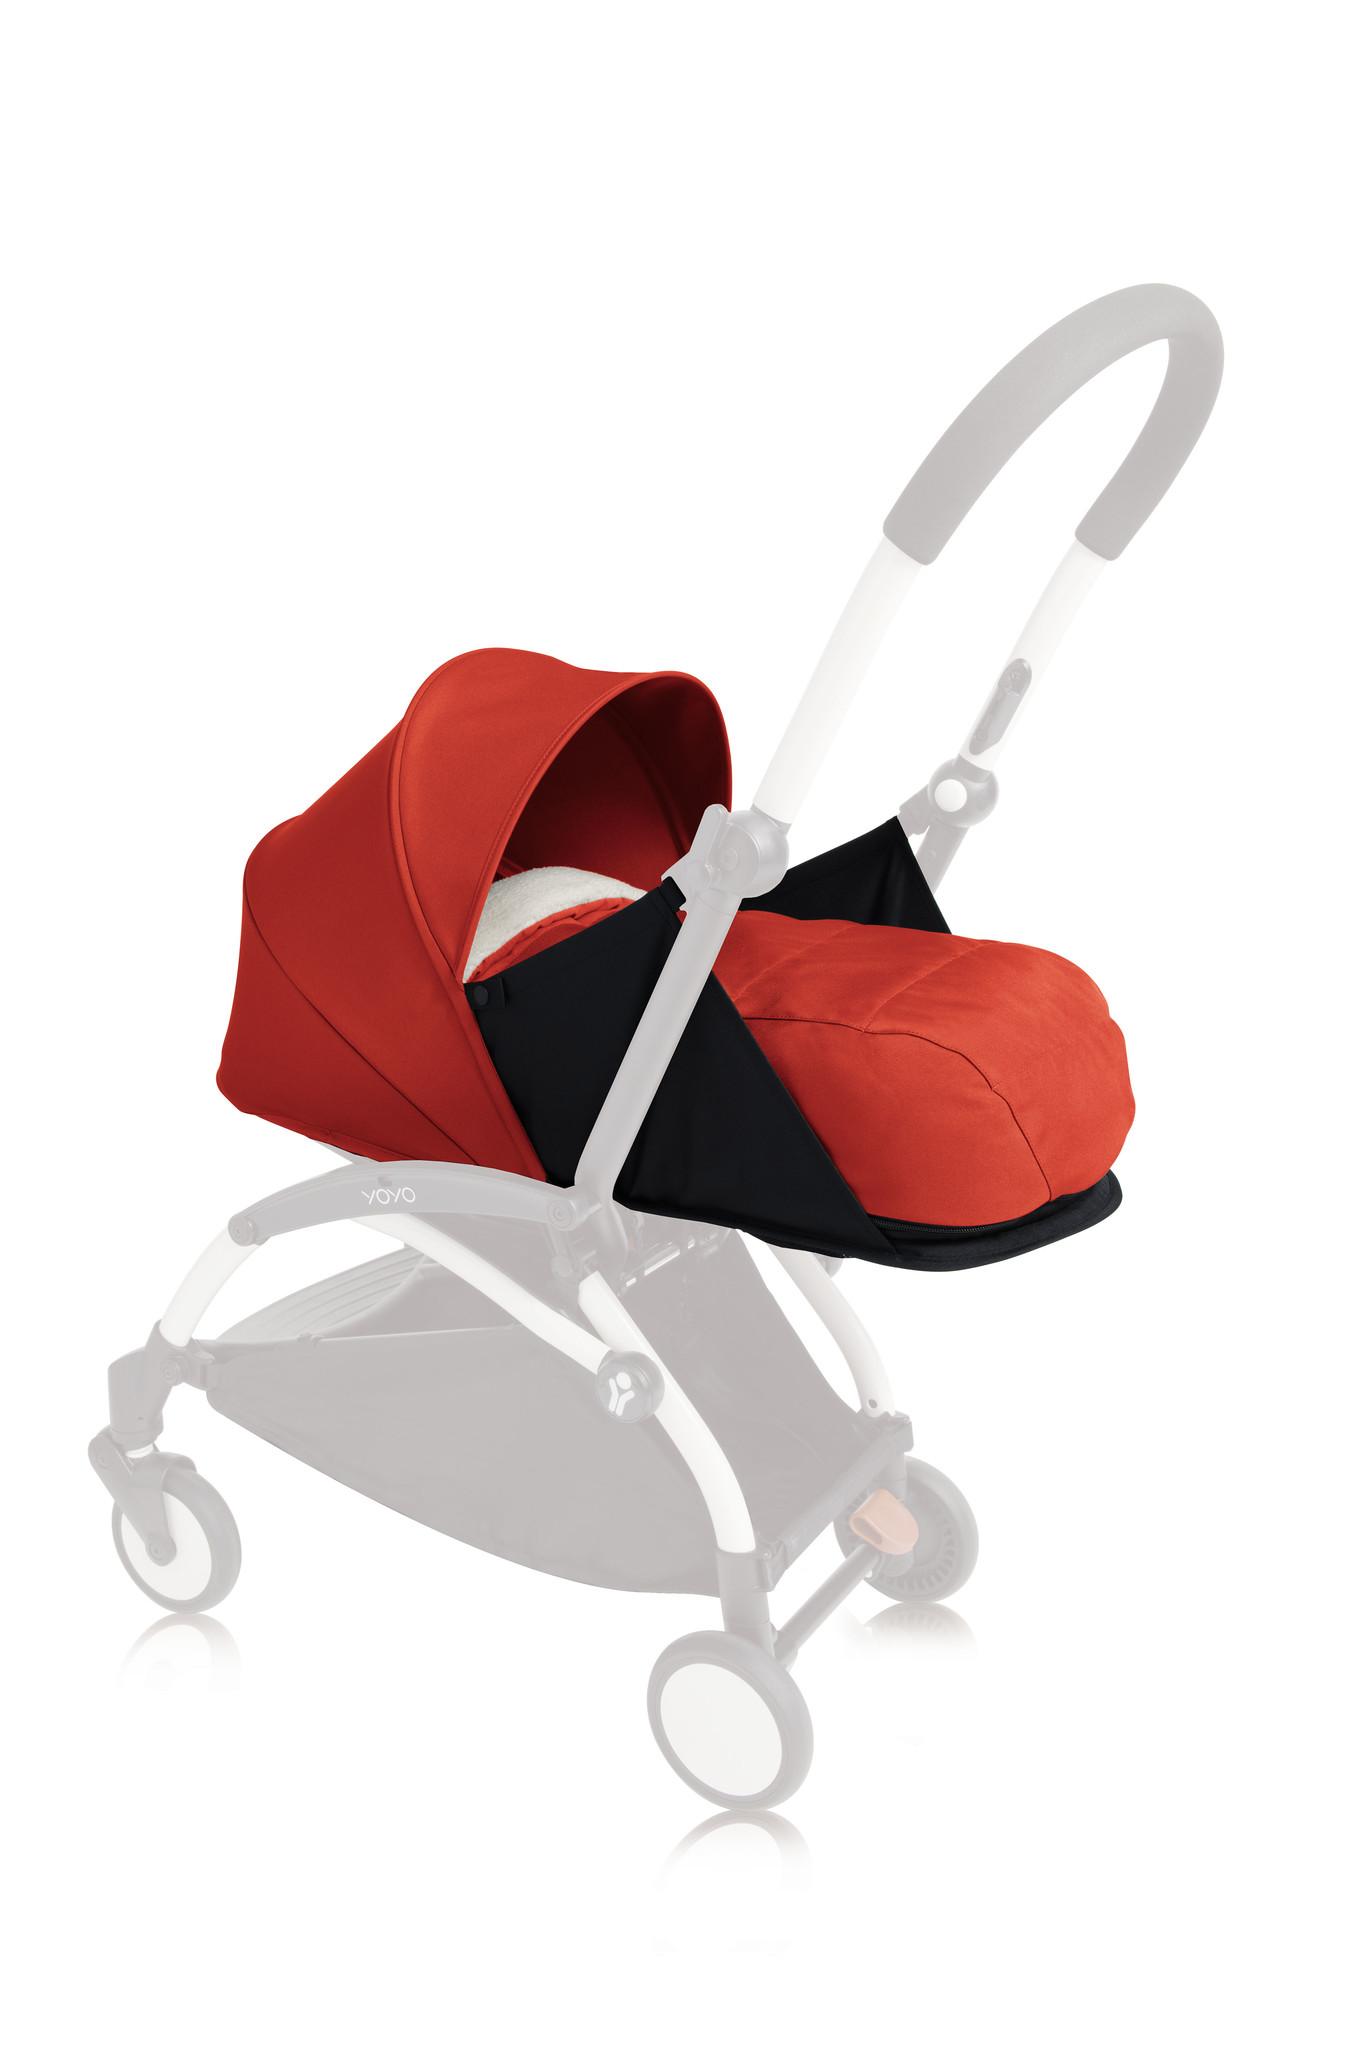 Babyzen Babyzen Yoyo 0+ Neugeborenenpackung - Rot 2020